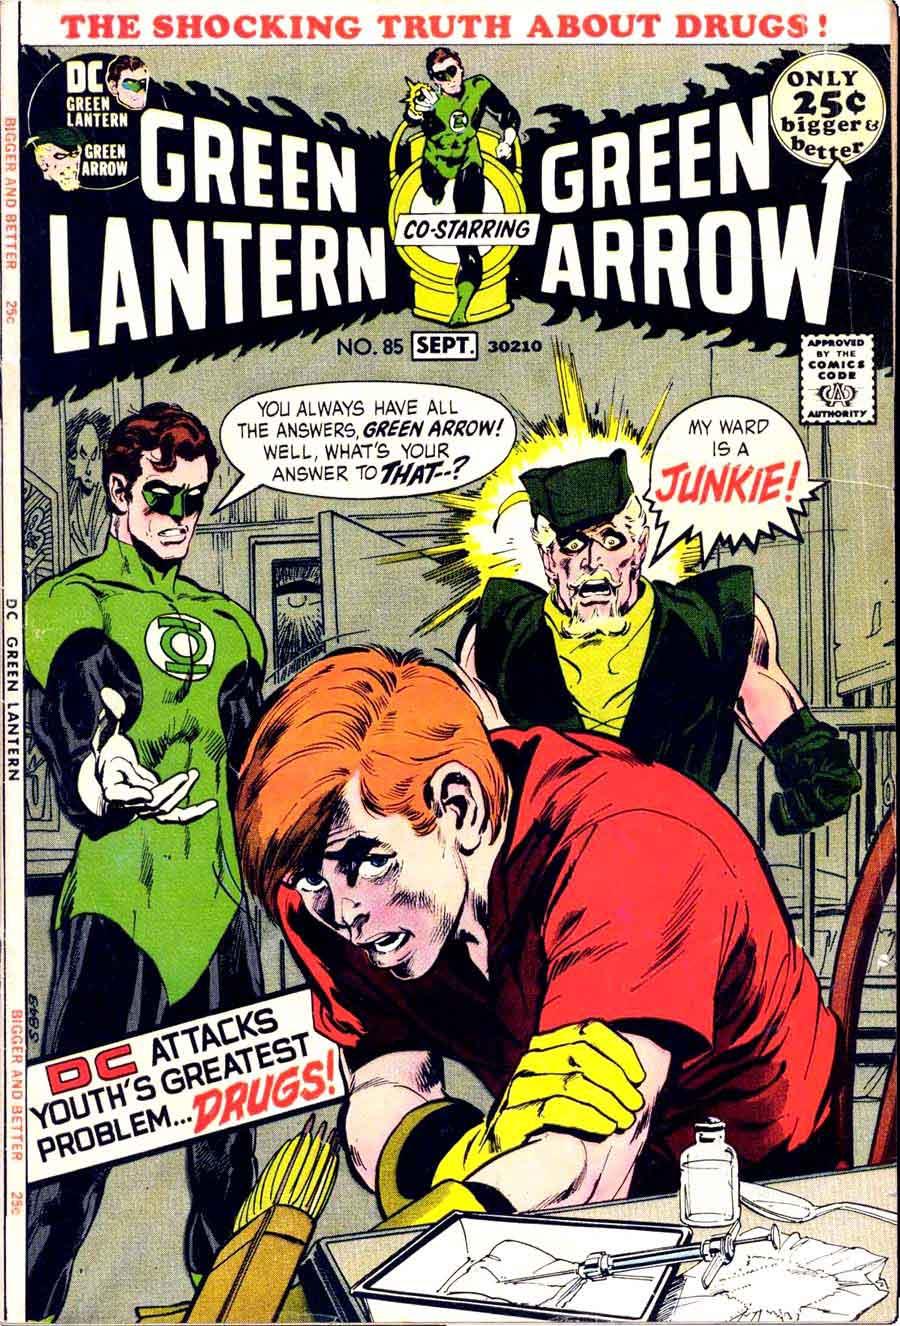 Green Lantern Green Arrow #85 dc comic book cover art by Neal Adams